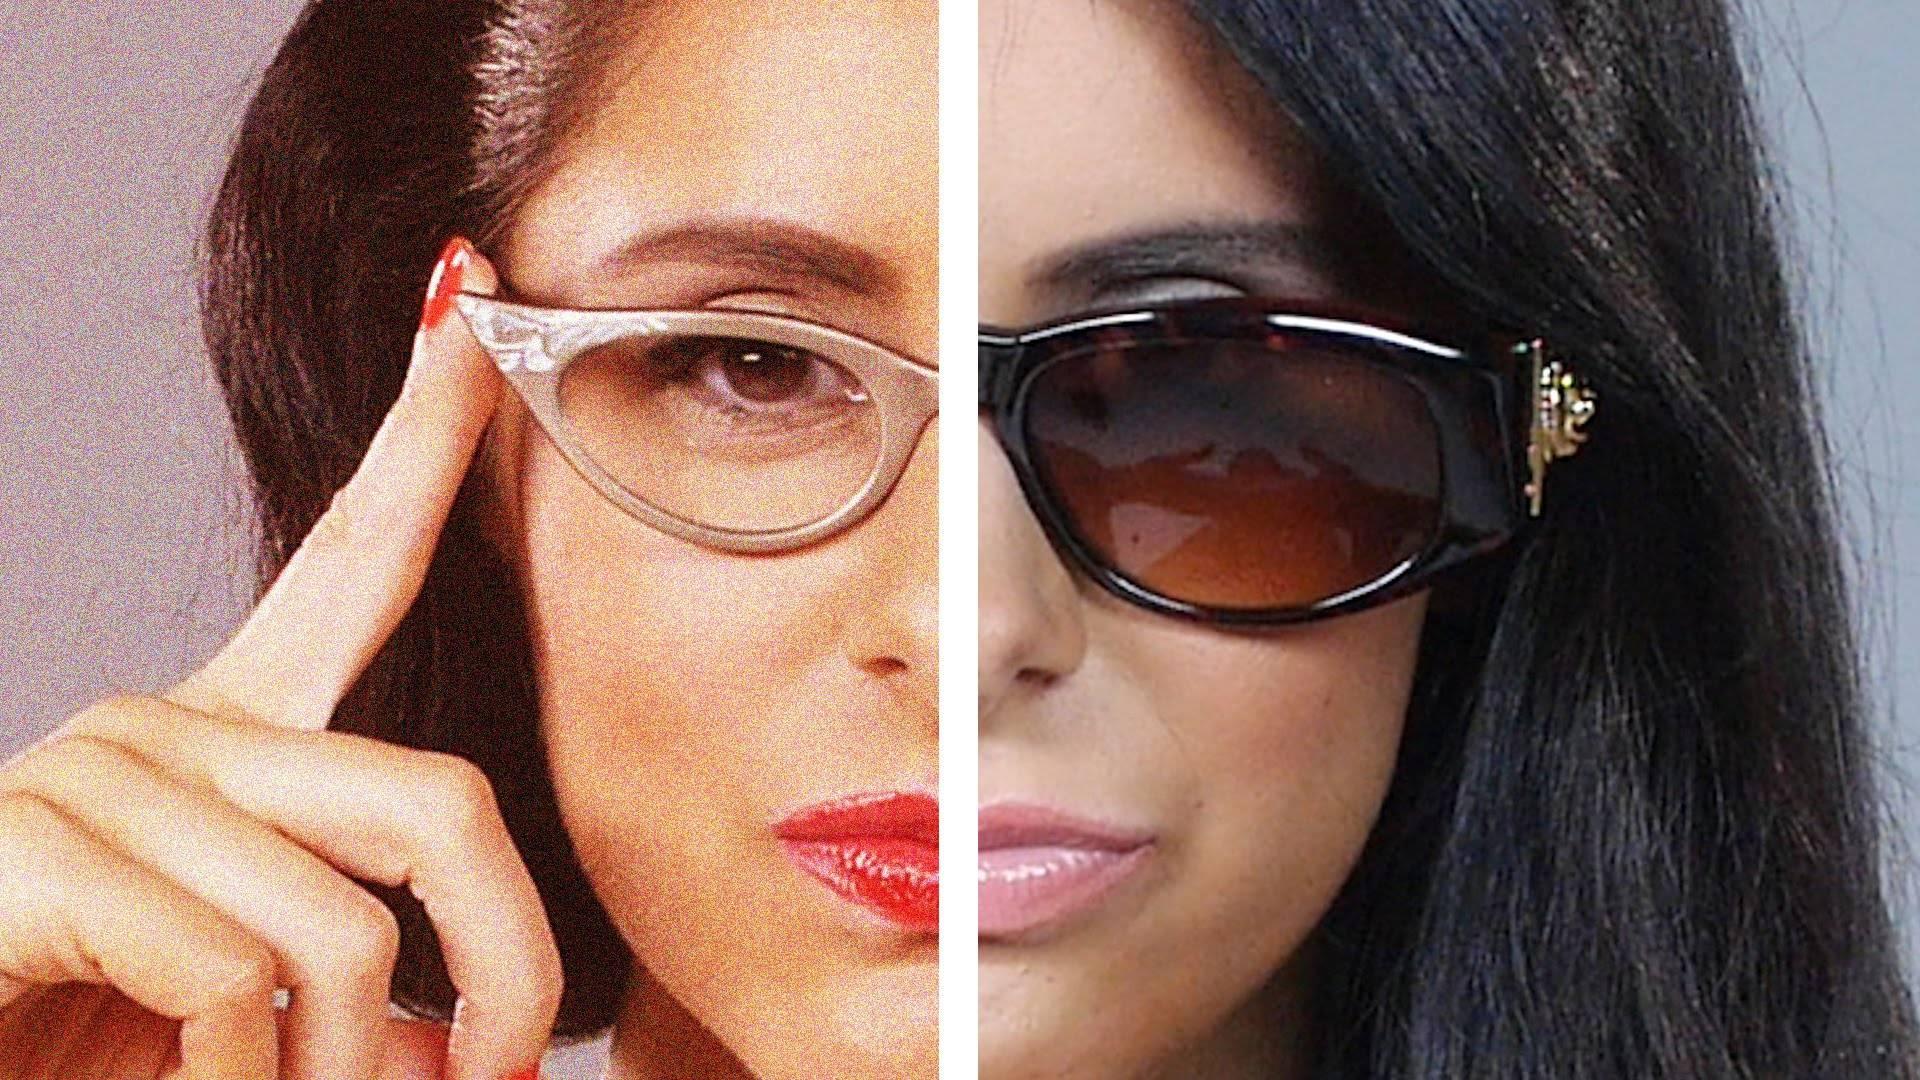 Очки — история возникновения | вещи и изобретения | багира гуру